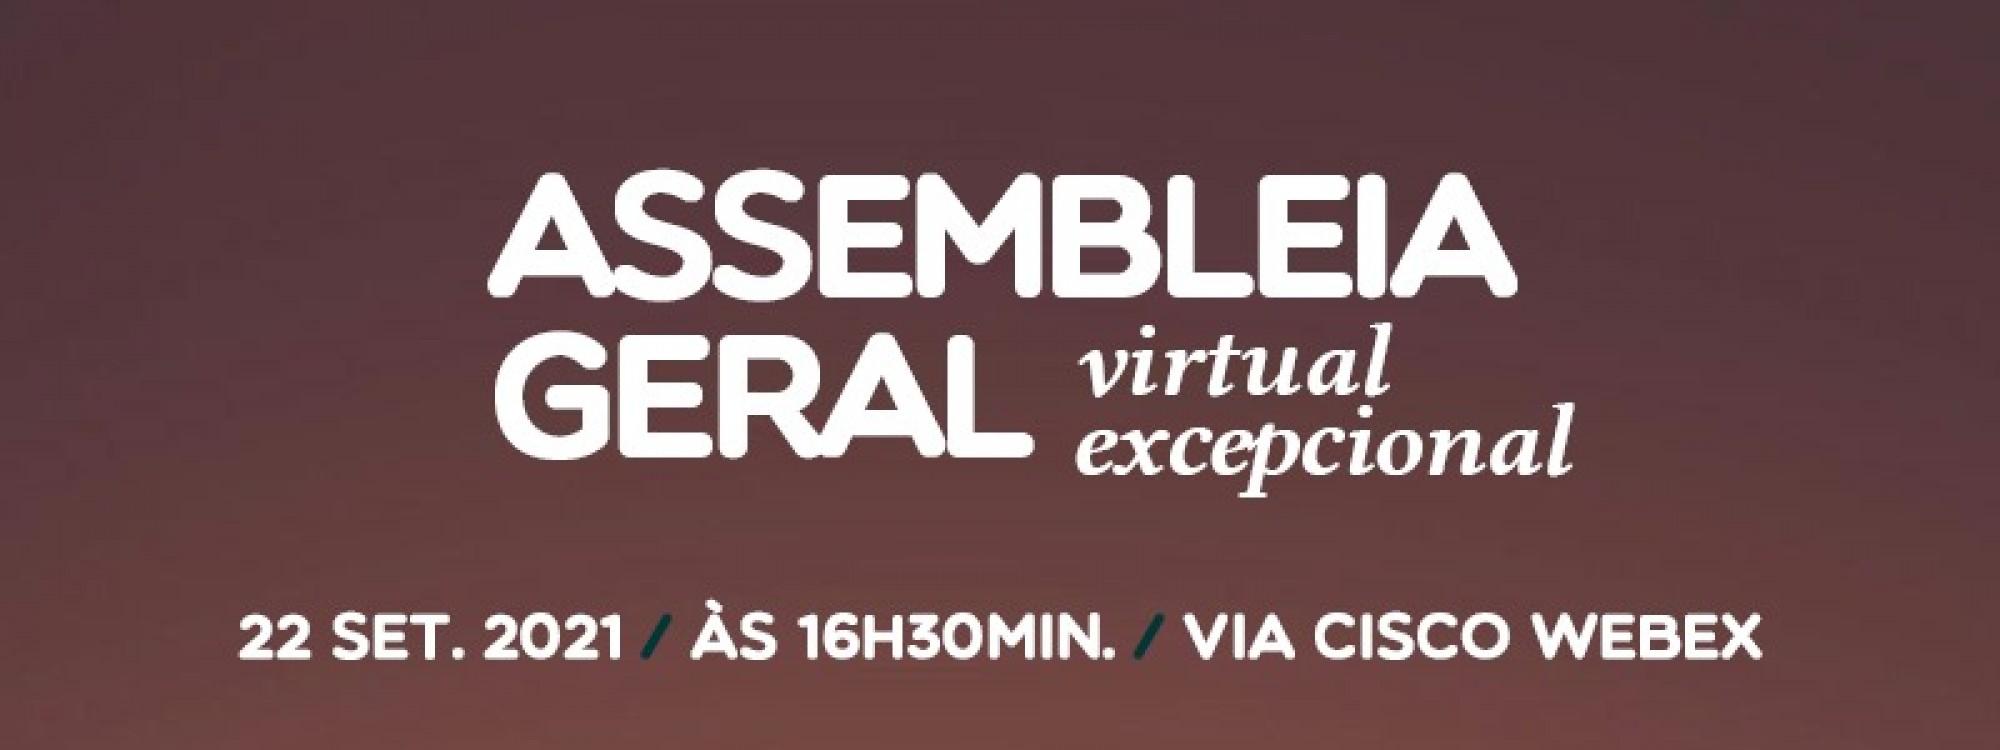 Assembleia Geral da ADUFU ocorre na próxima quarta, 22